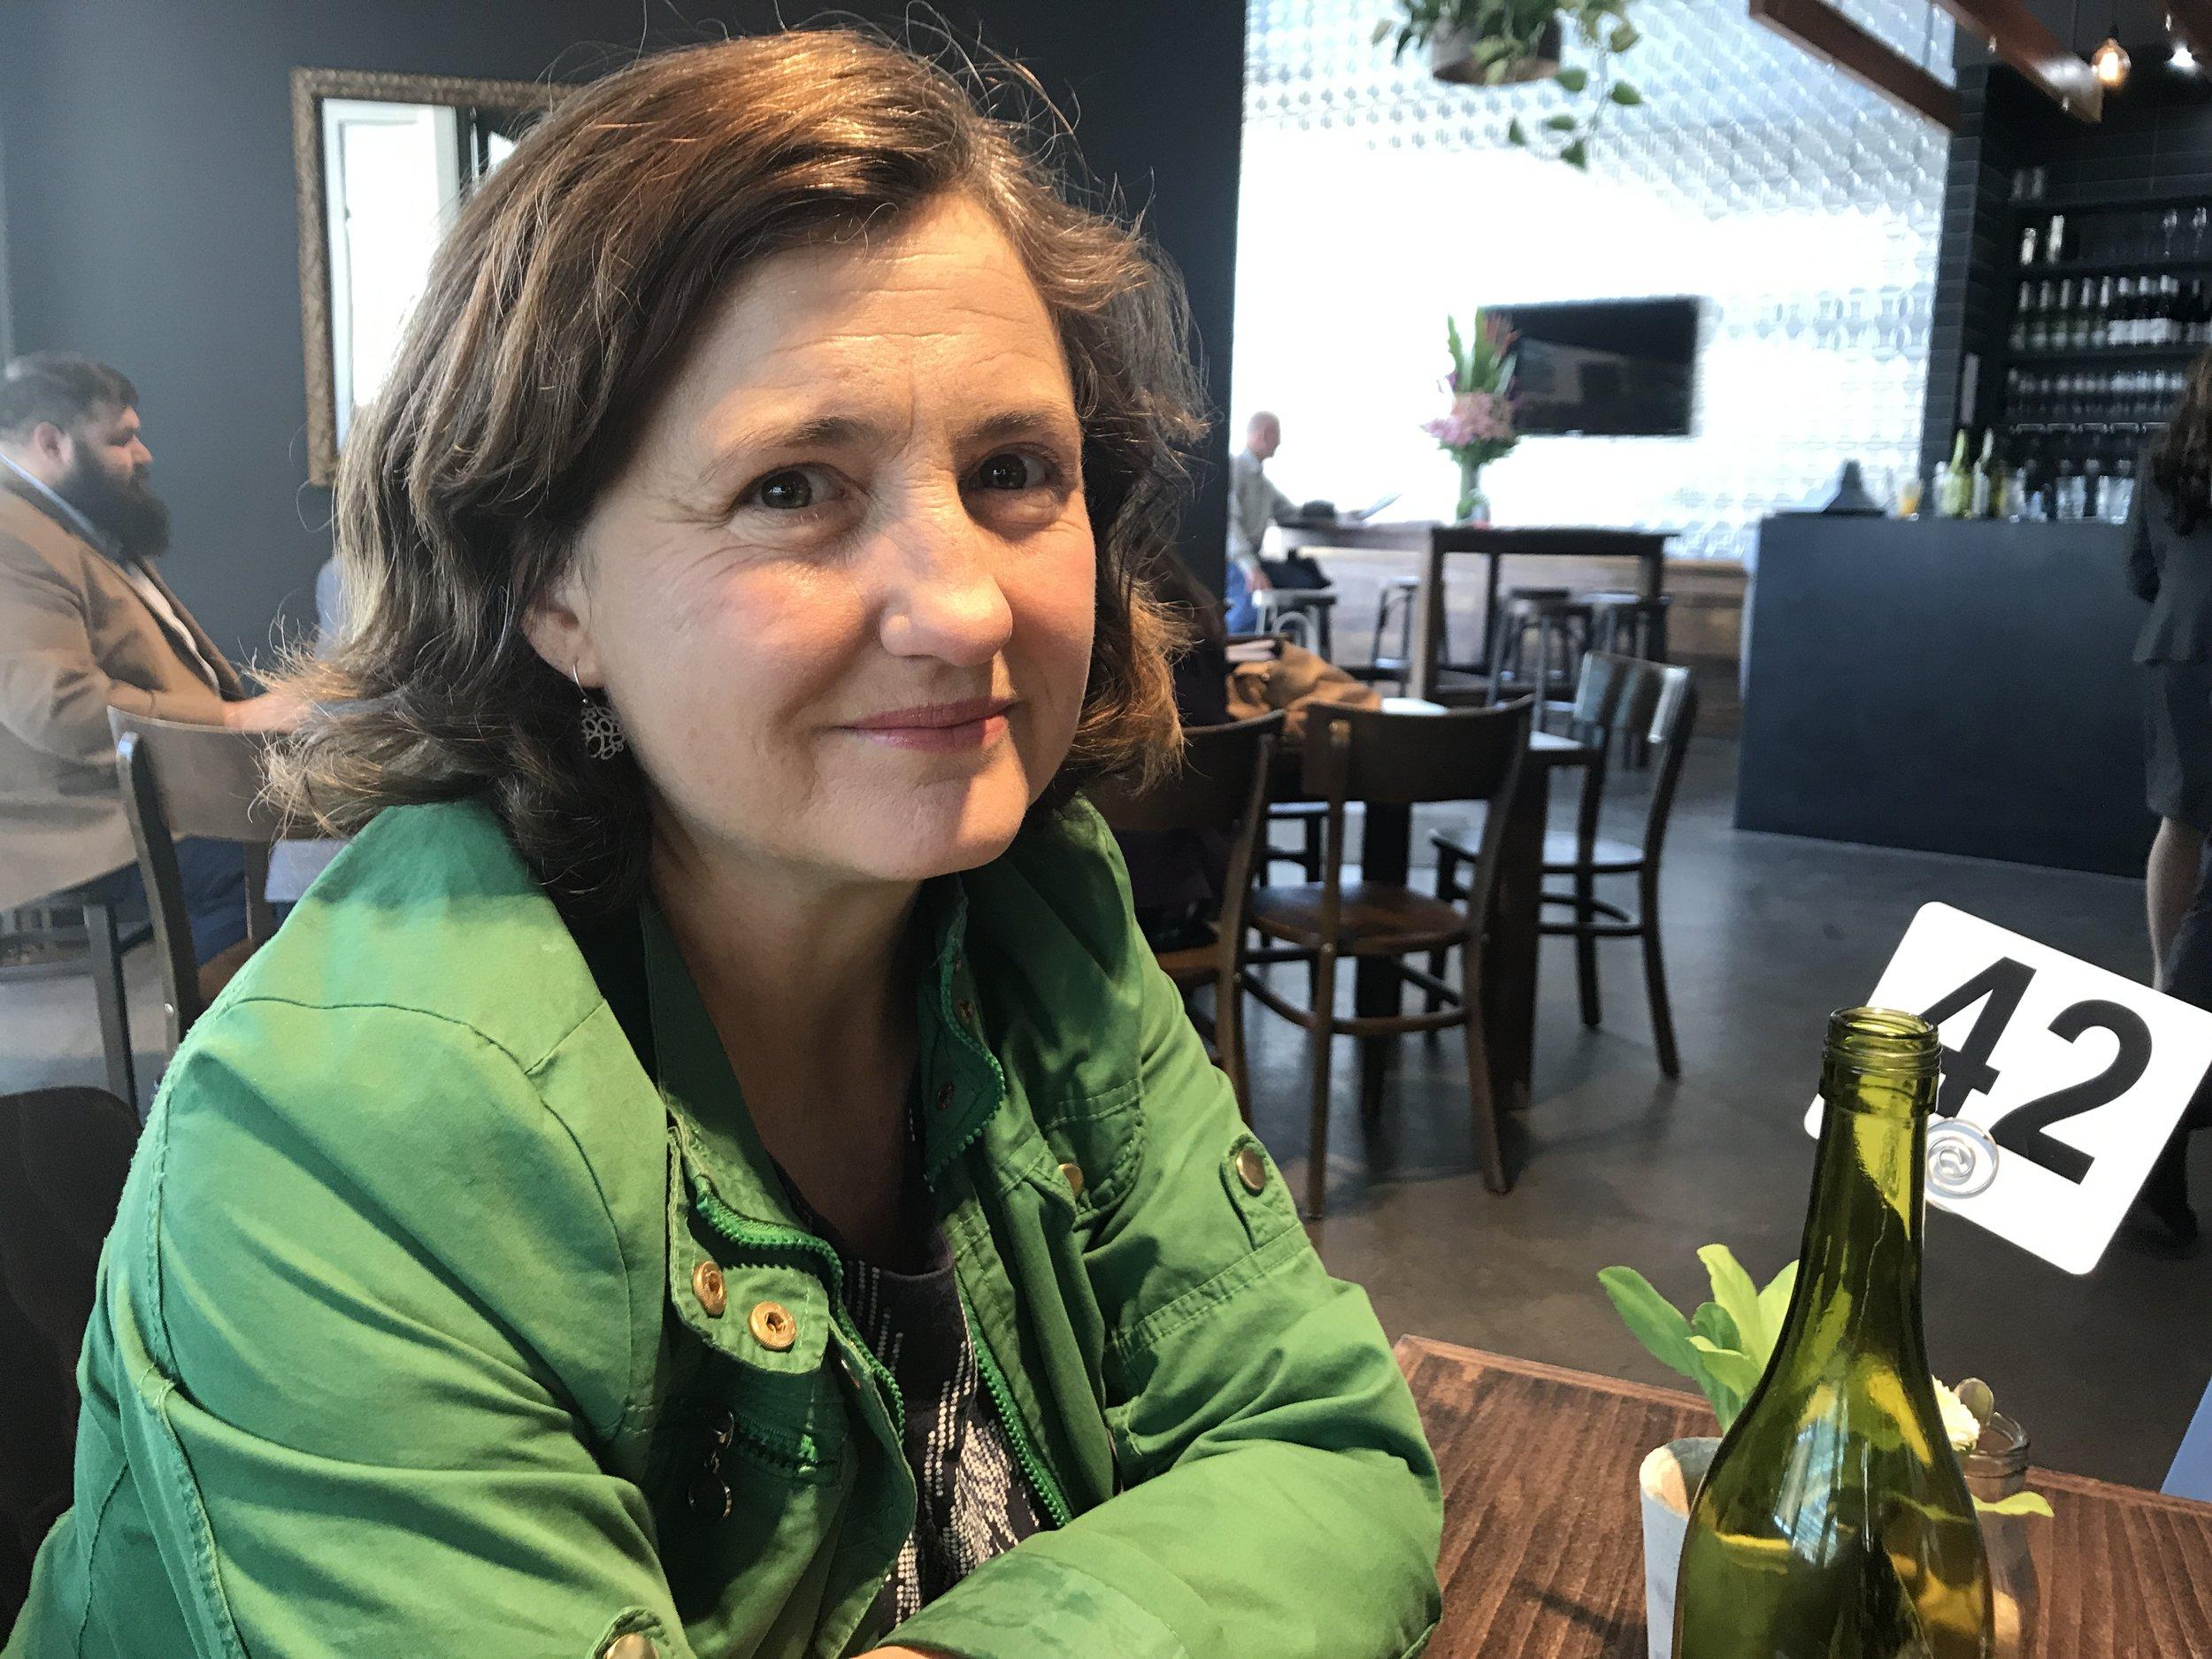 Rebecca Blackburn, interviewed by Slobodanka Graham at Equinox cafe, Canberra